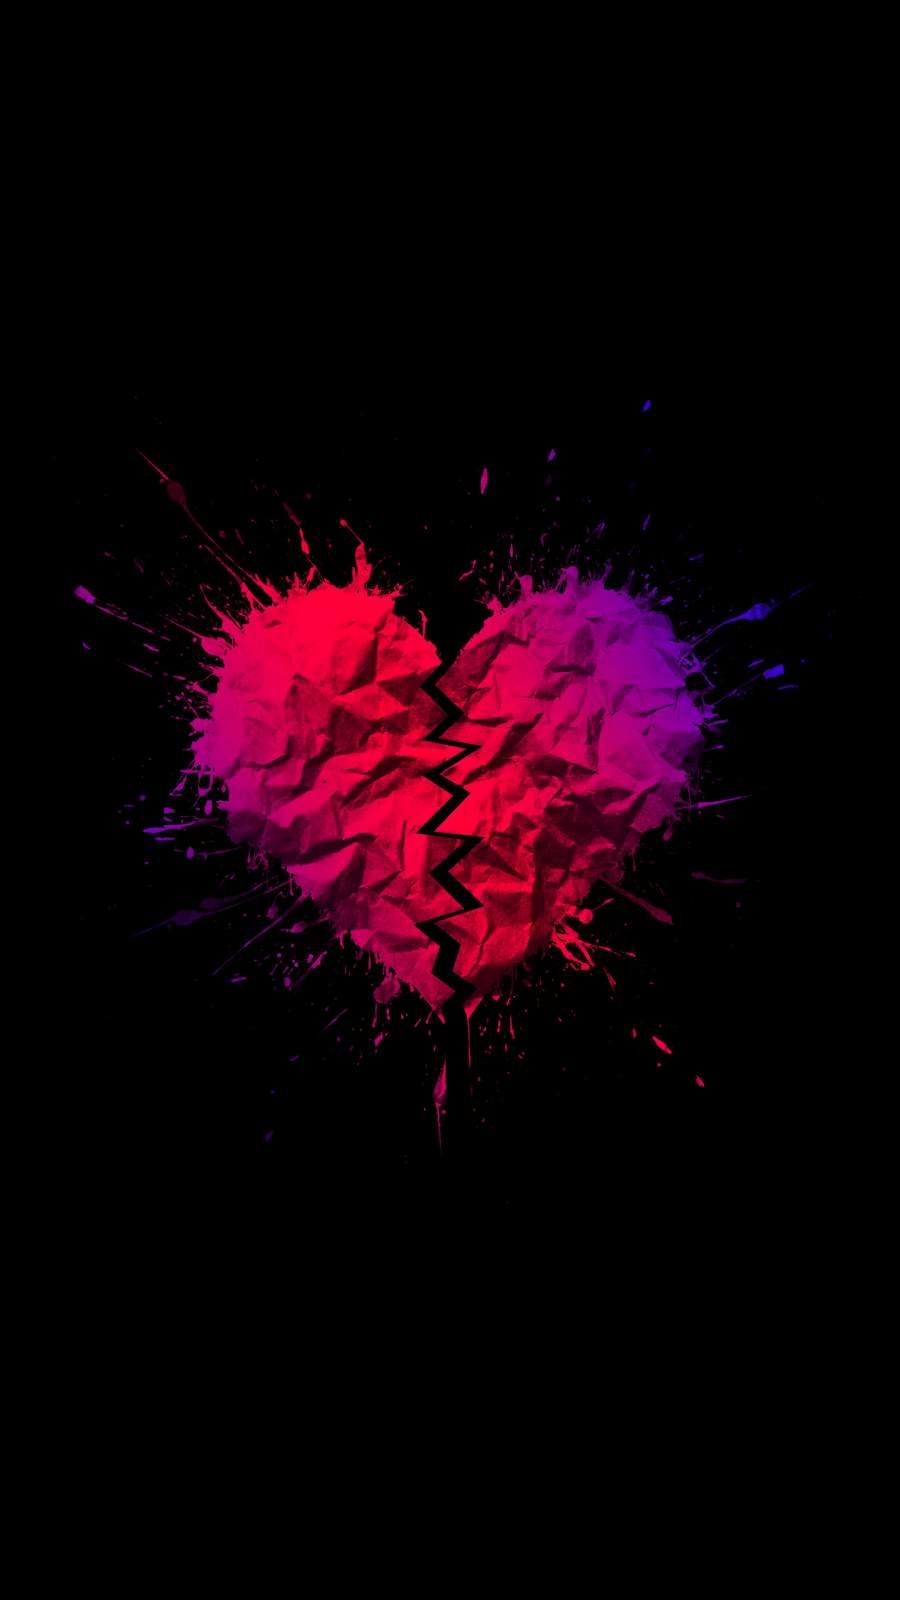 Amoled Love